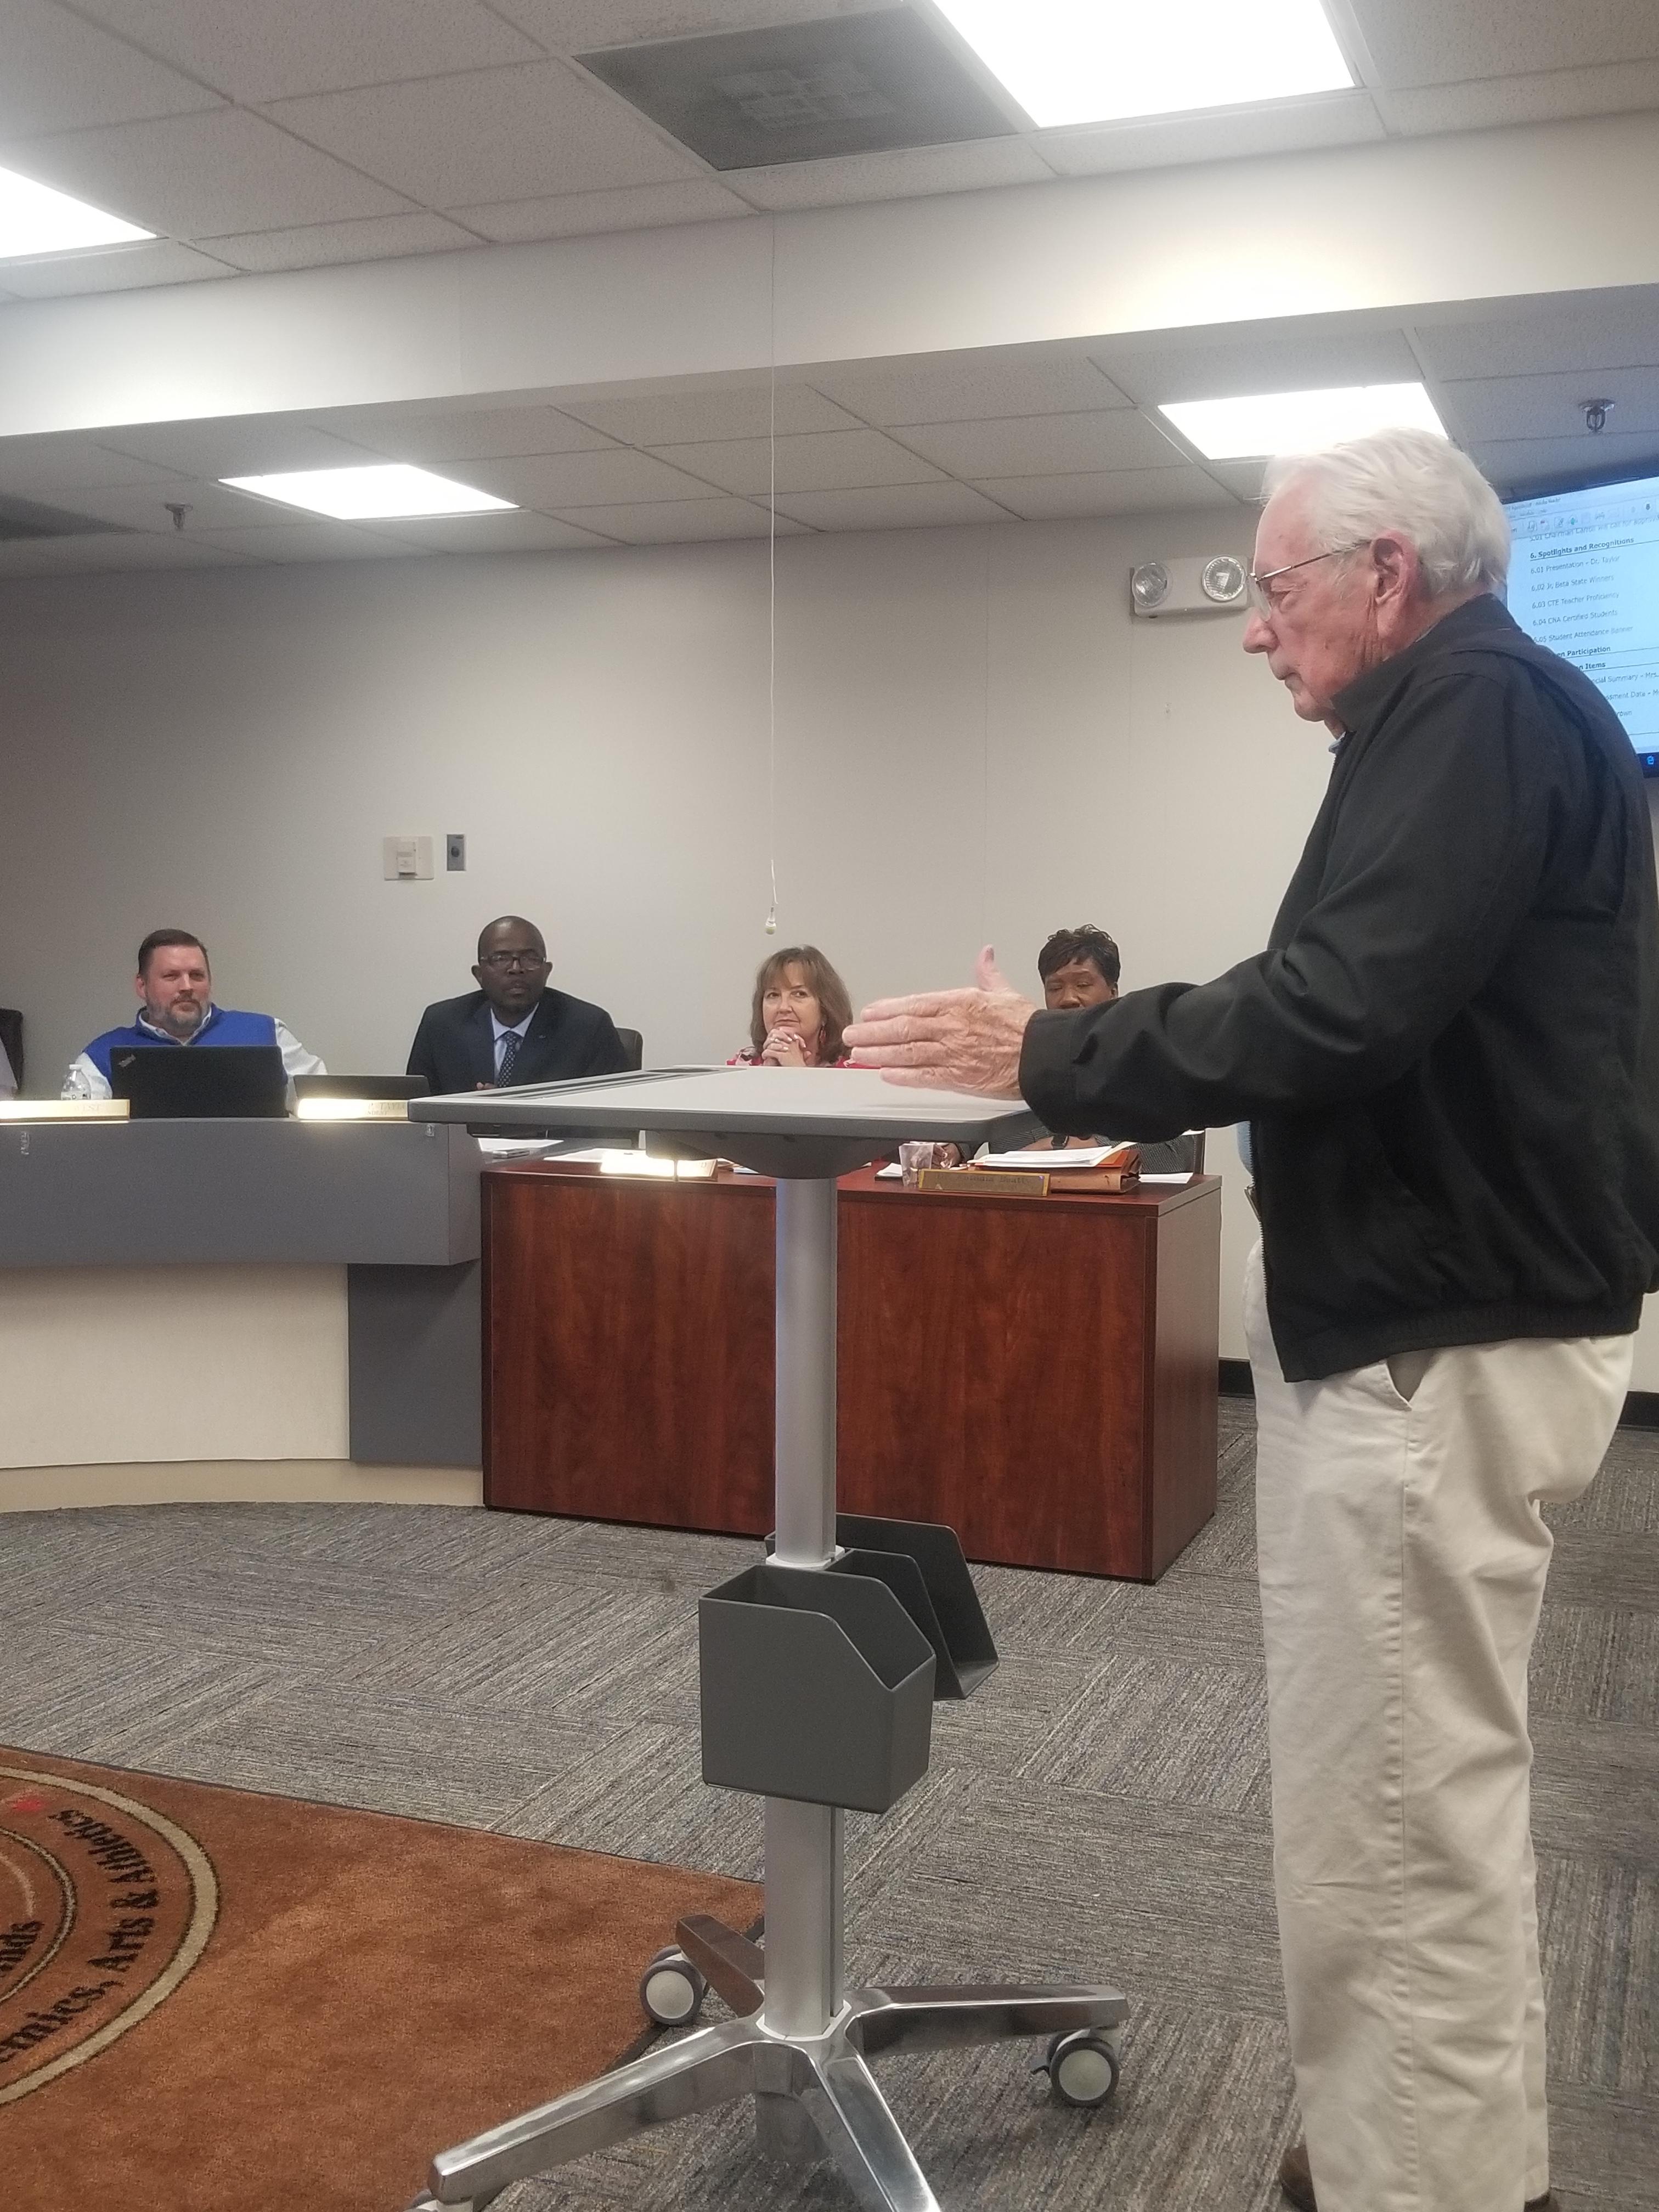 David Clark Board of Education